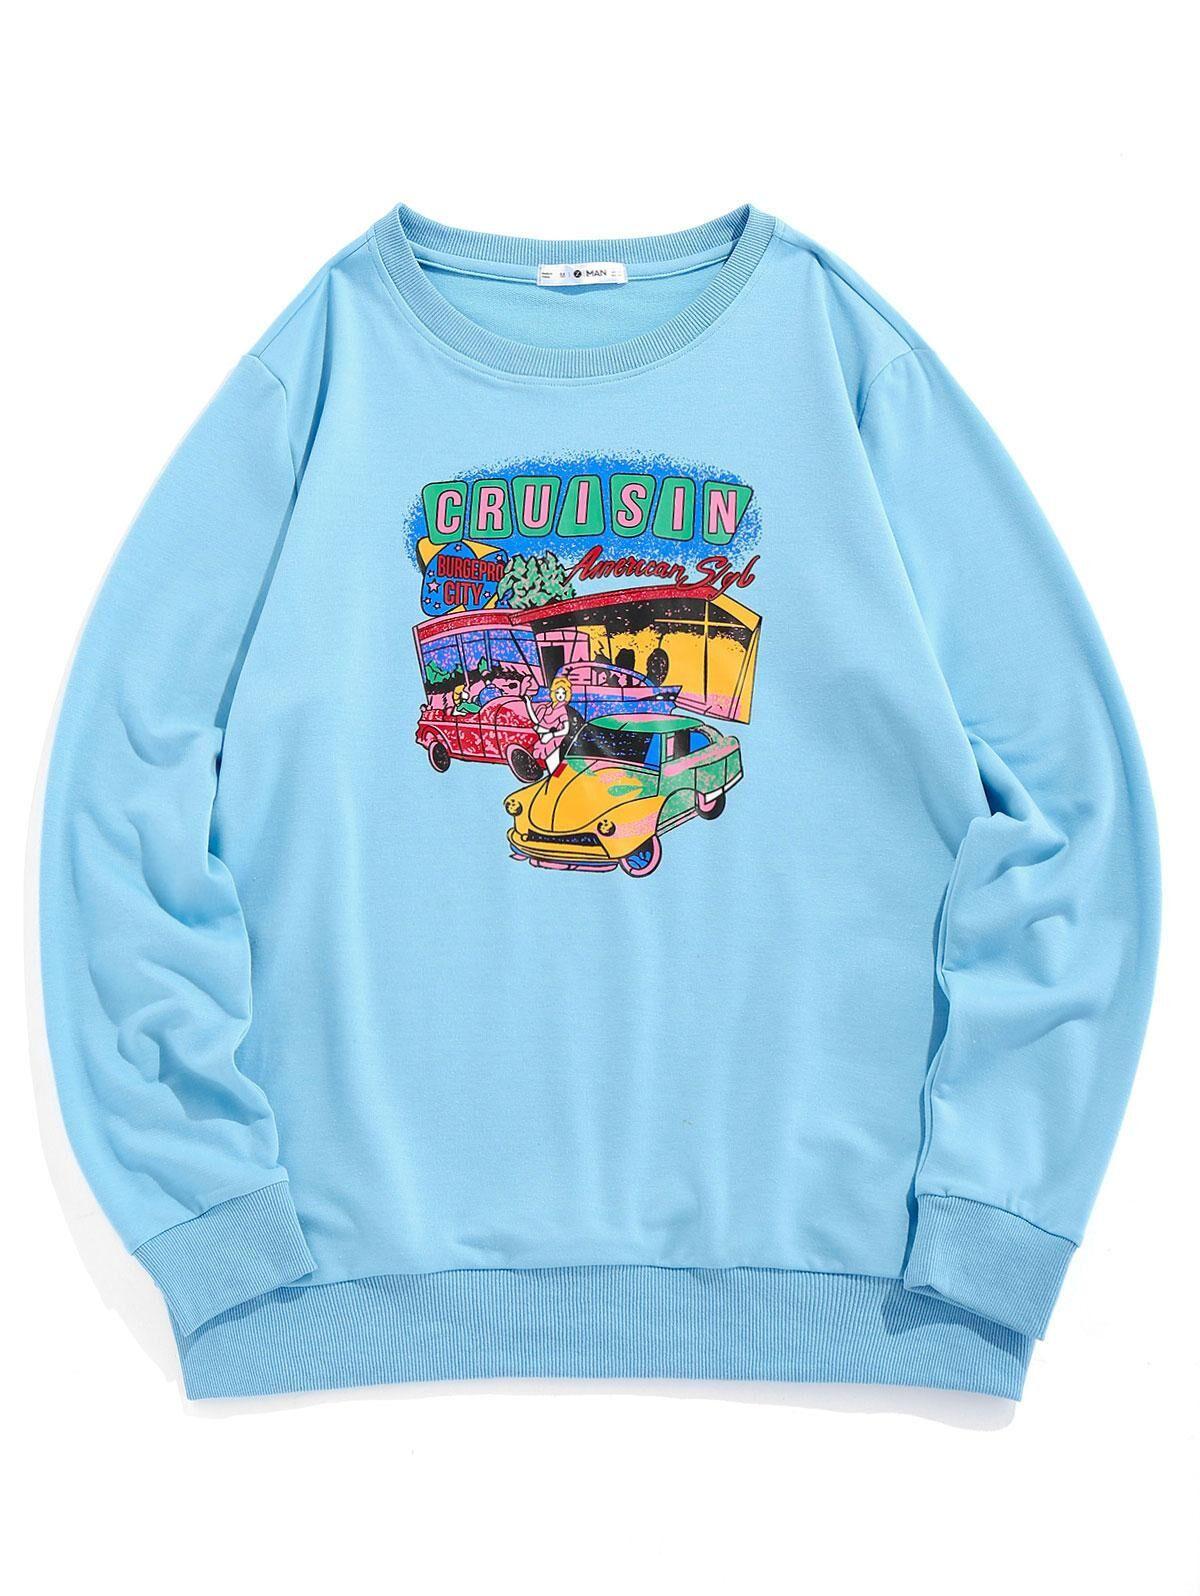 ZAFUL Cartoon Car Print Graphic Sweatshirt in LIGHT BLUE - Size: Small